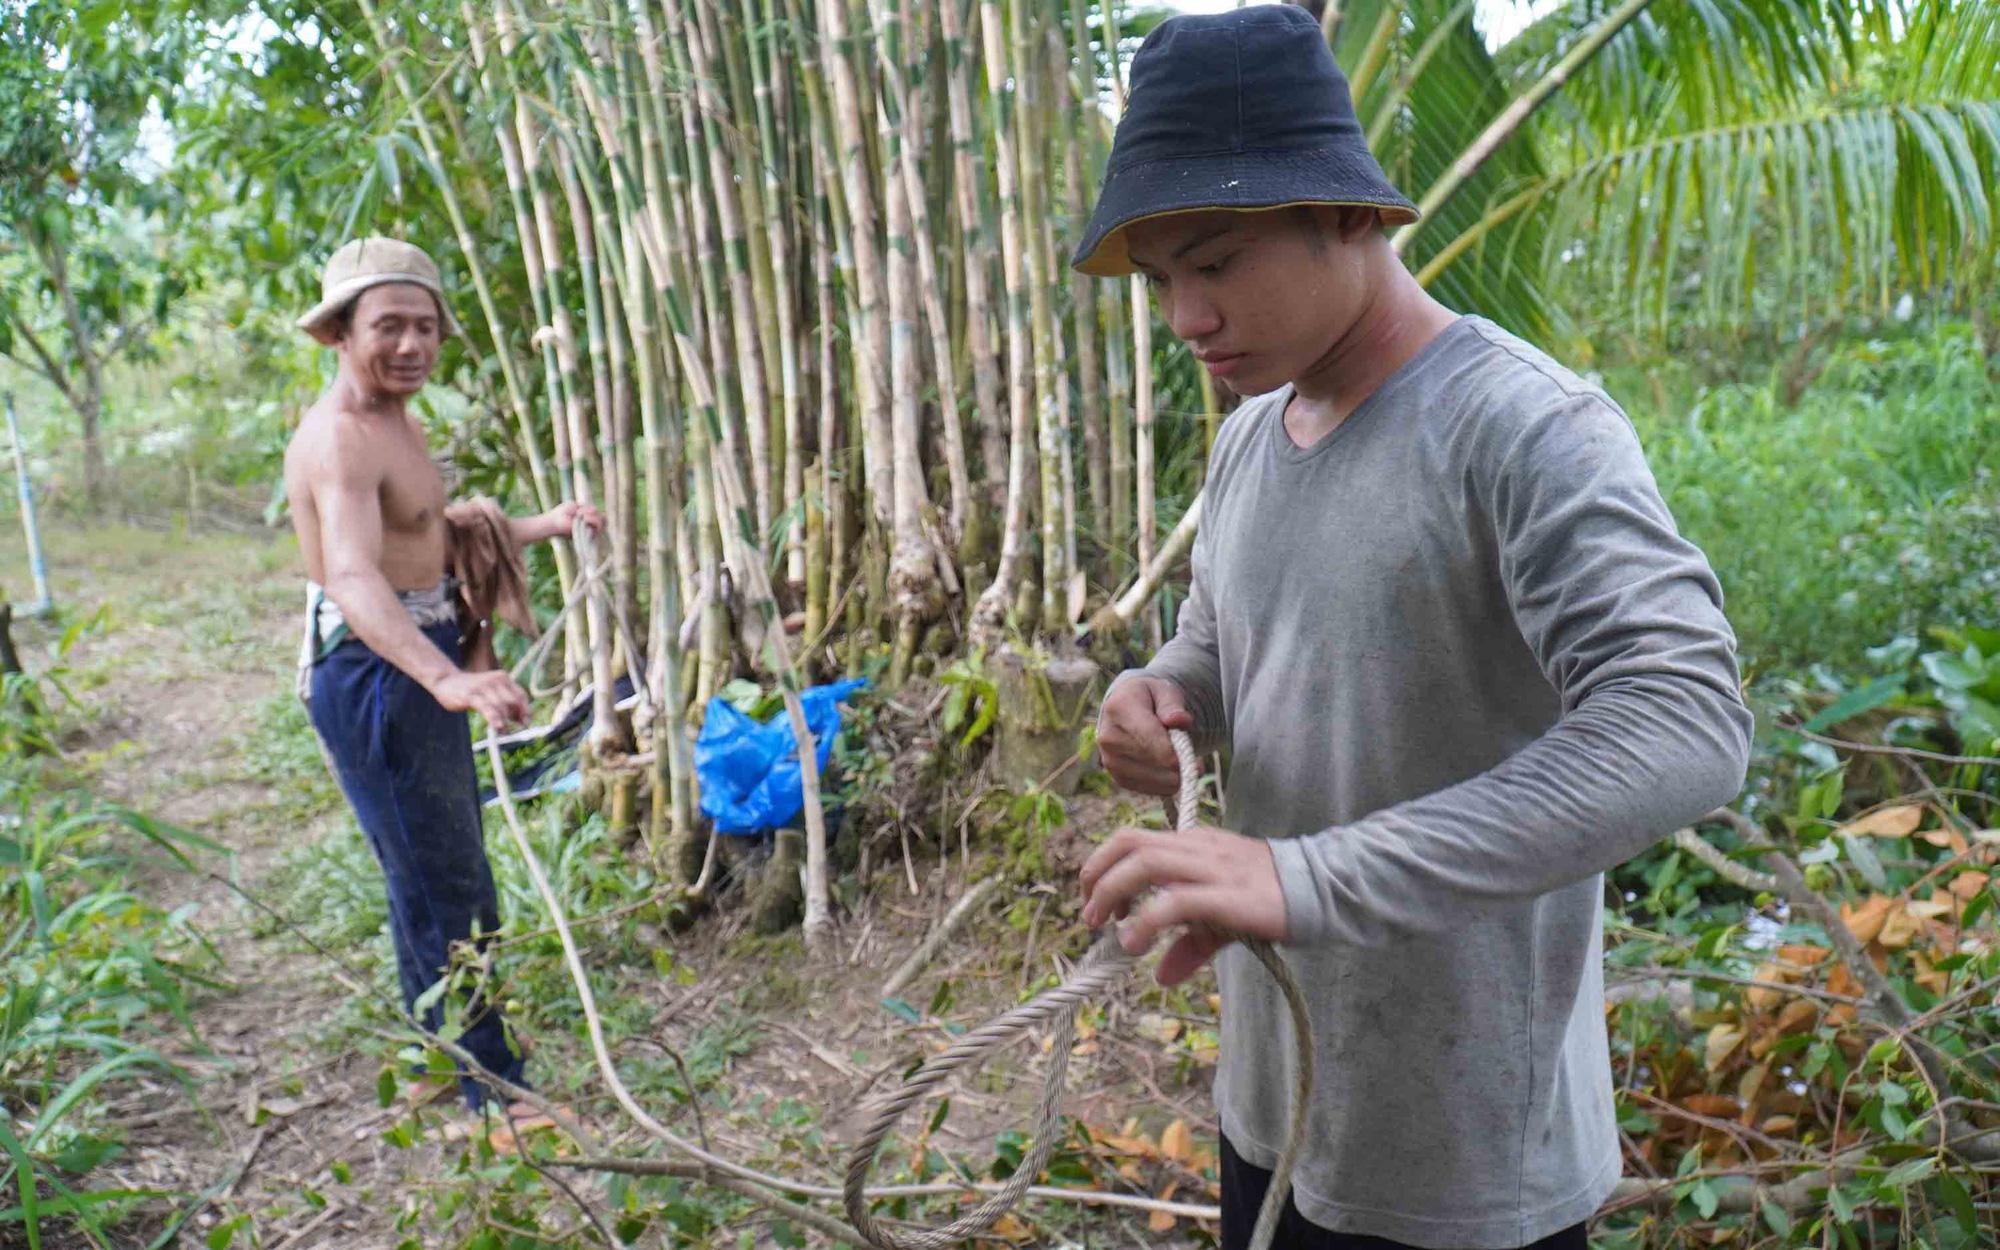 Pham Thanh Tung's son helps him prepare for the job. Photo: Mau Truong / Tuoi Tre